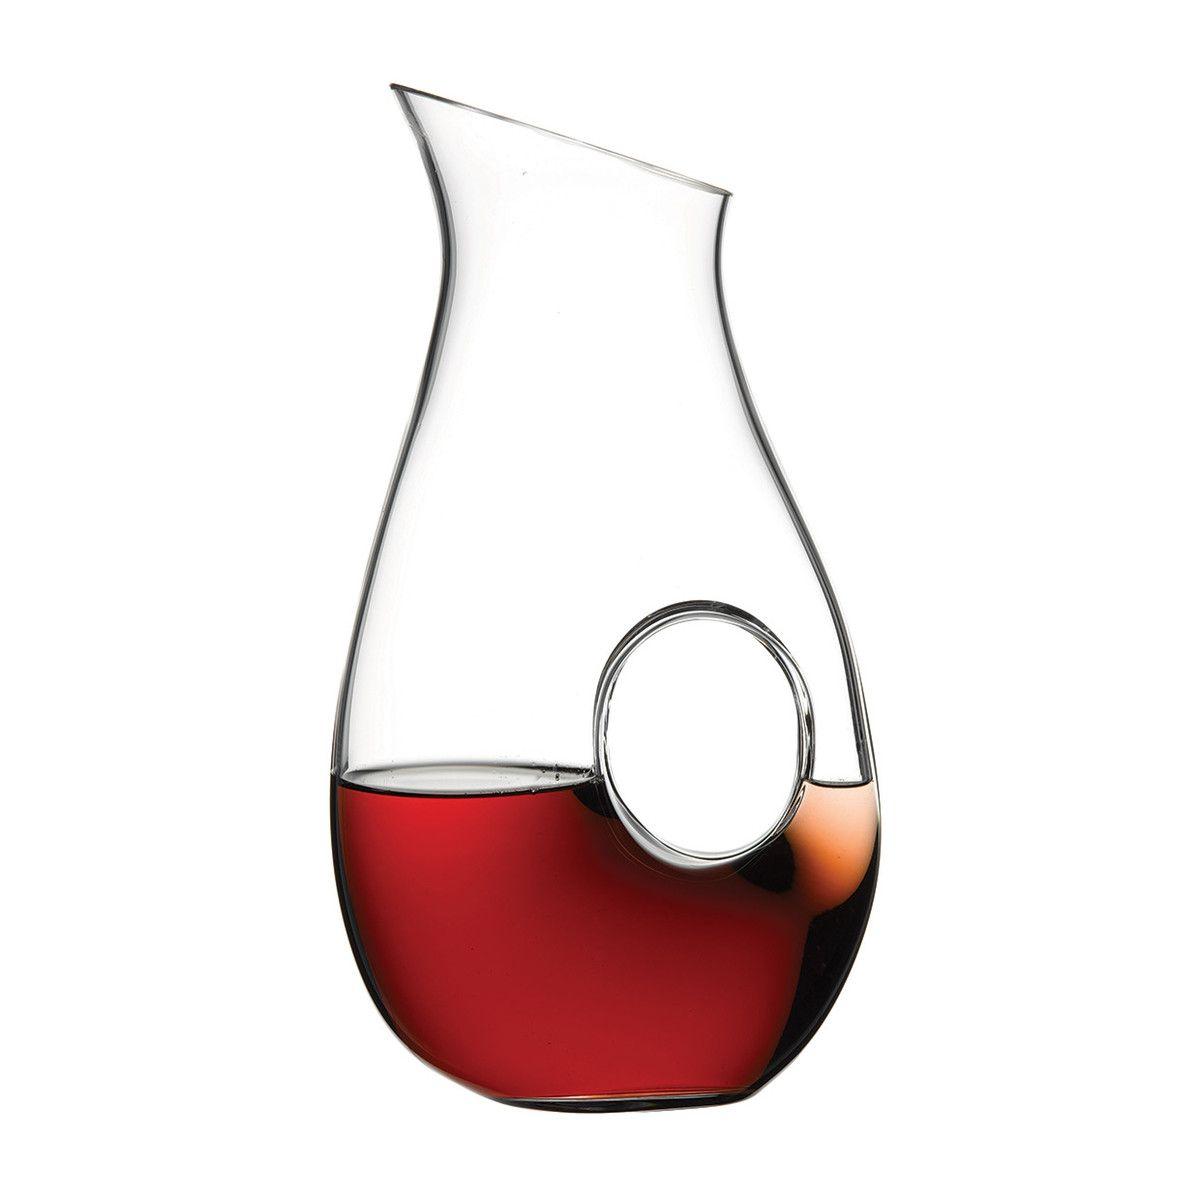 Halo Wine Carafe Wine Carafe Glass Wine Decanter Carafe